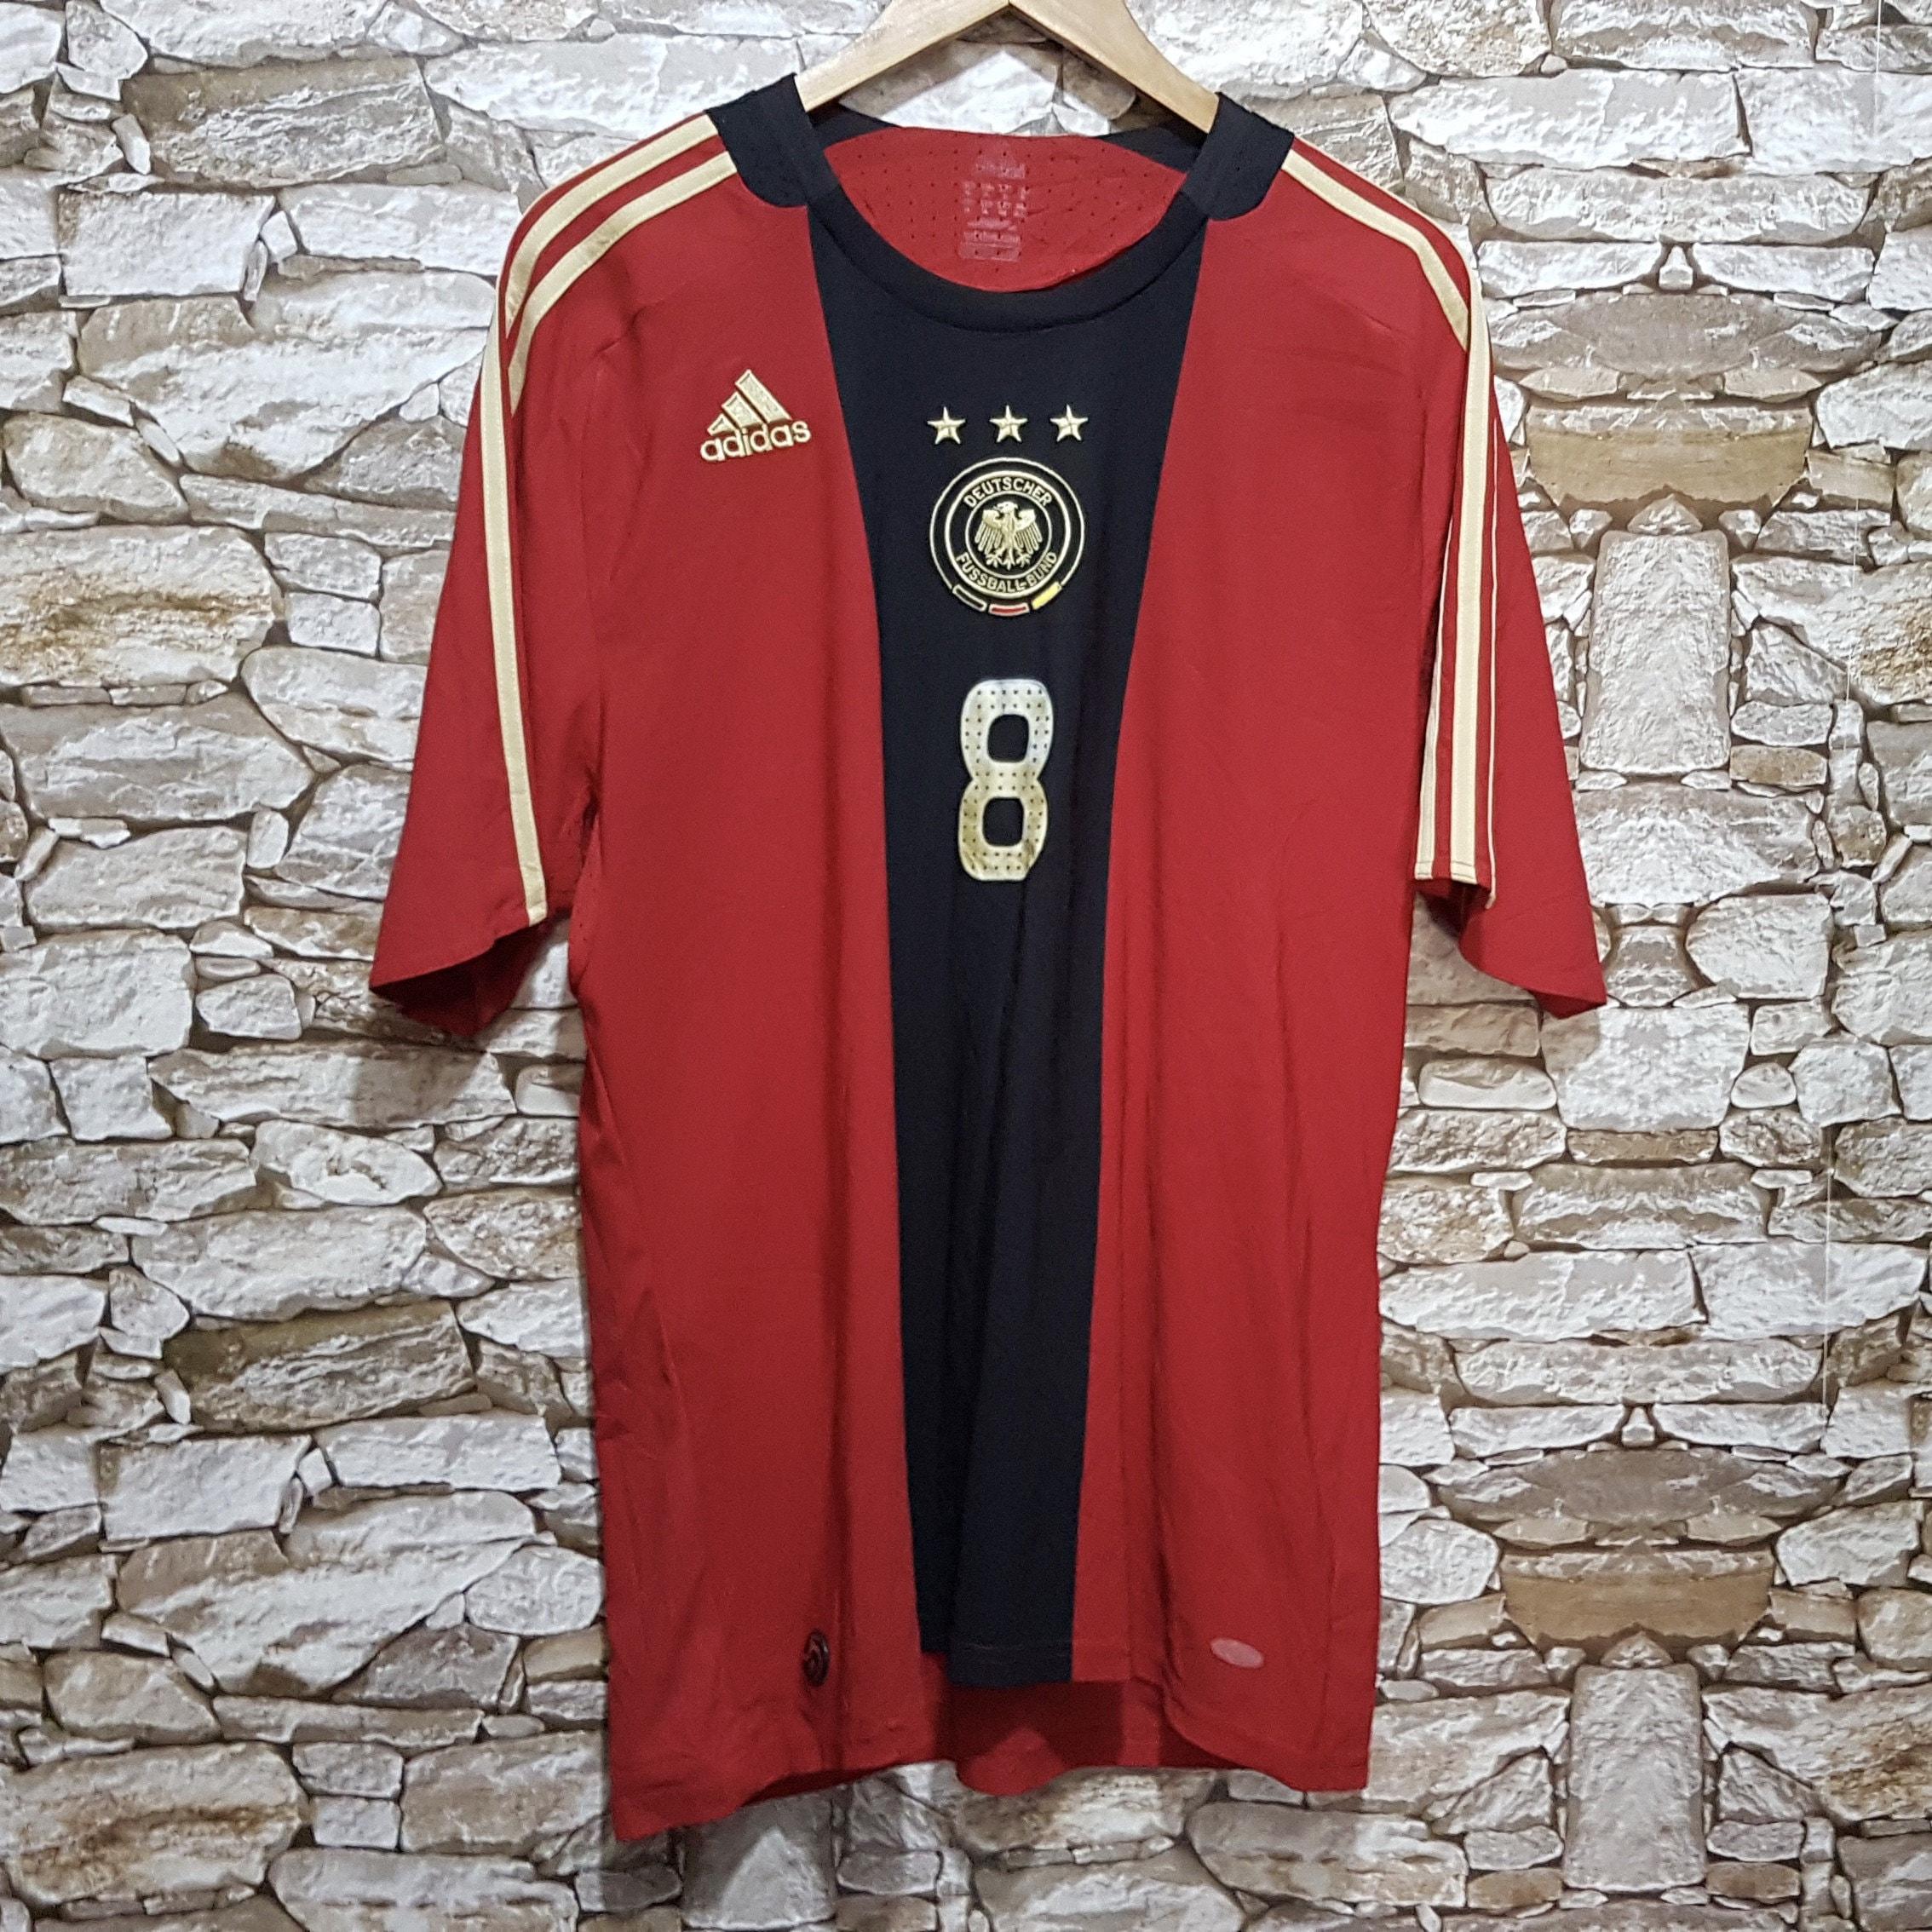 Vintage Adidas Germany Frings Soccer jersey football shirt men size: XL /90s old school Sportswear shirt/vintage clothing men